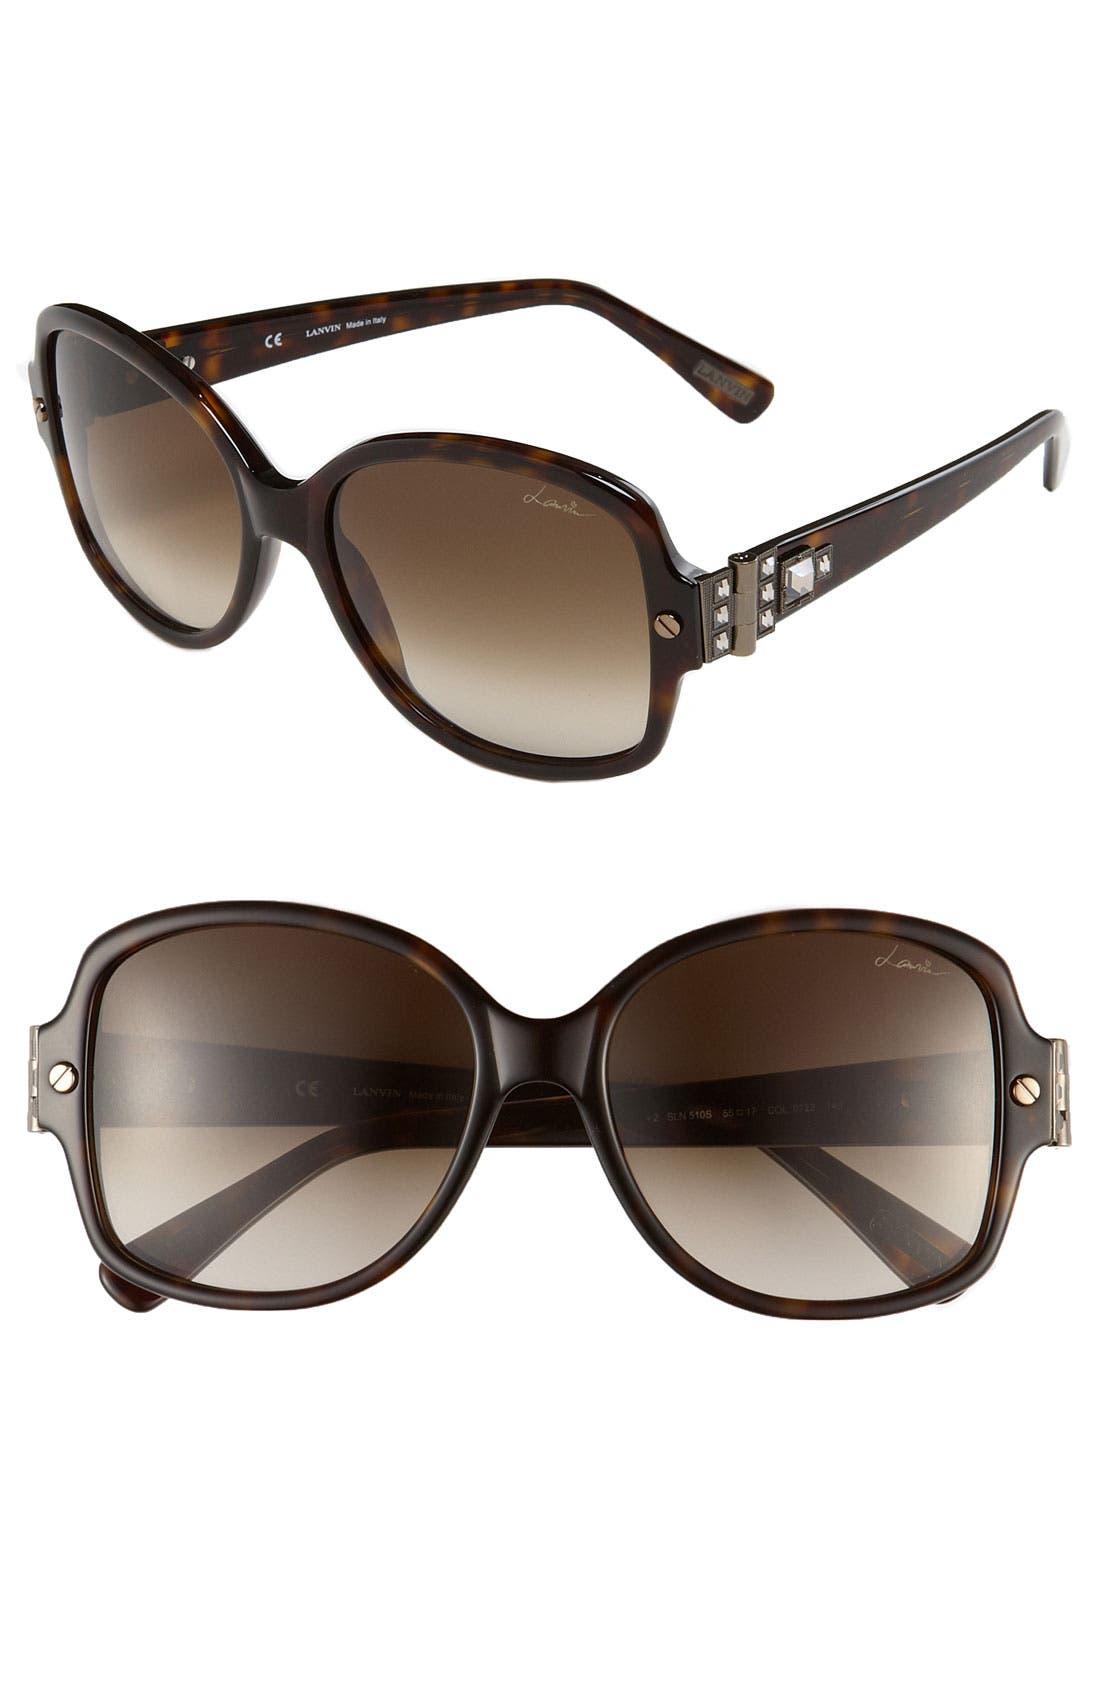 Main Image - Lanvin Oversized Swarovski Crystal Sunglasses